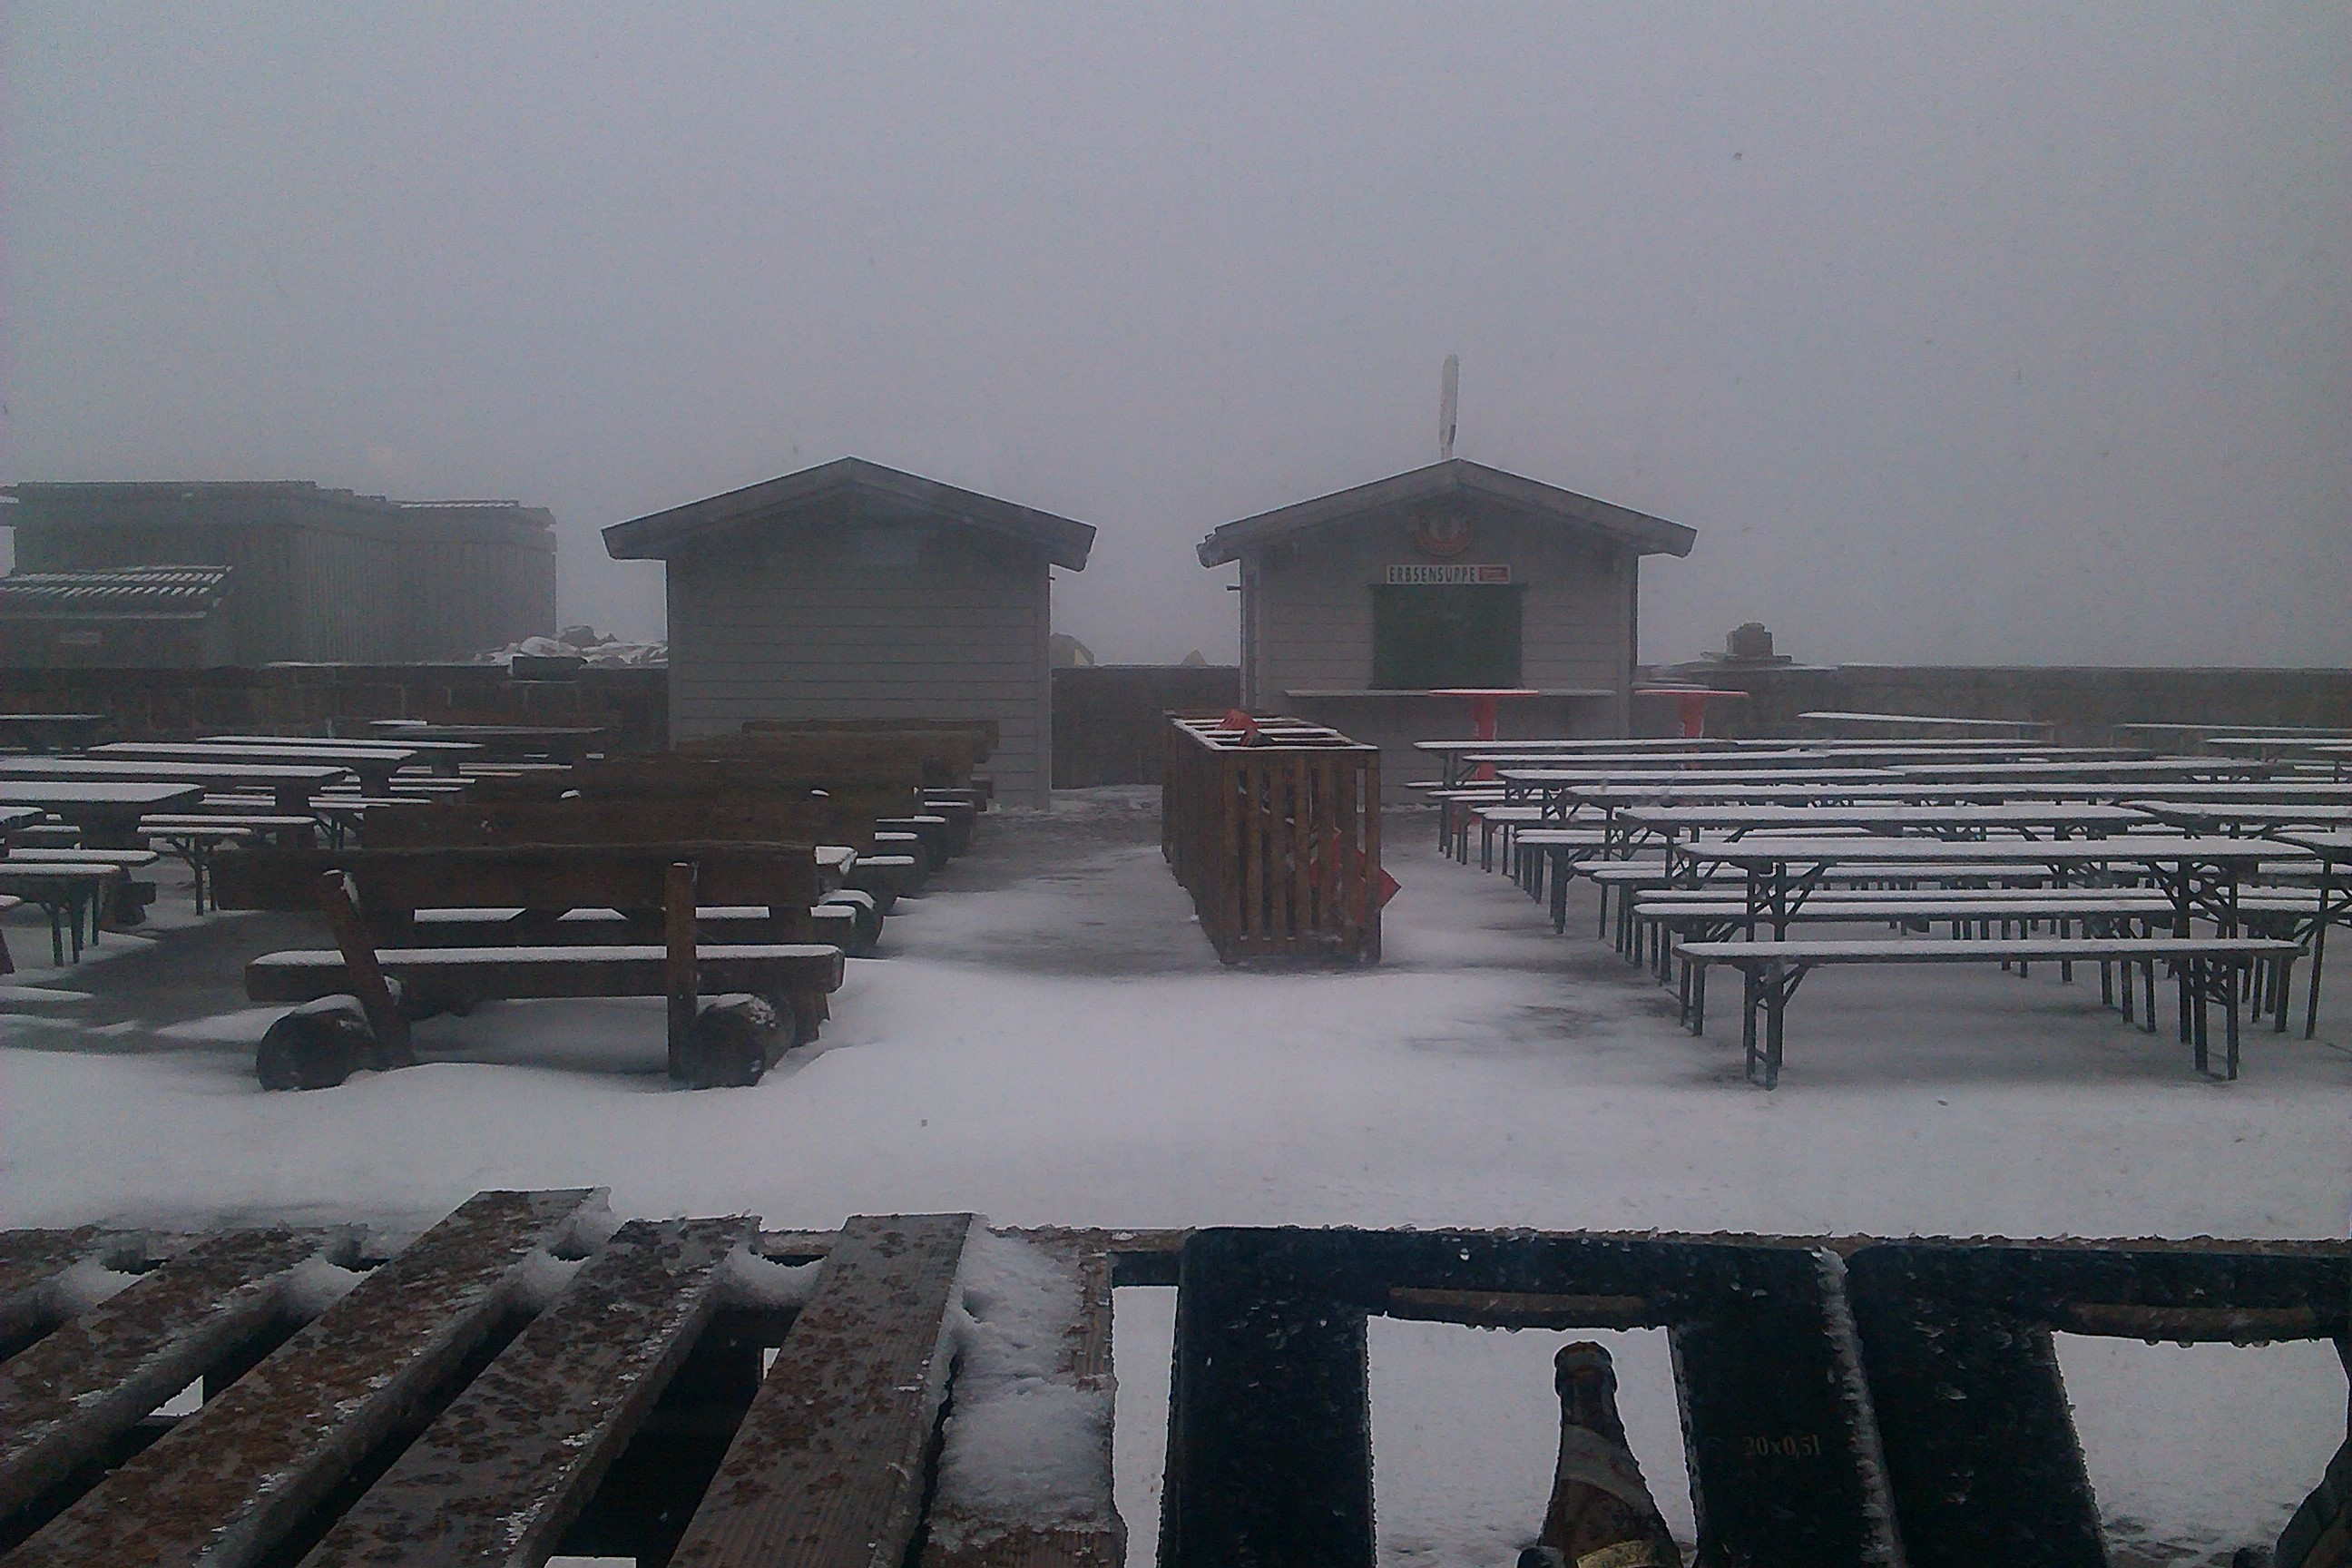 Der Biergarten auf dem Brocken ist gerade geschlossen...